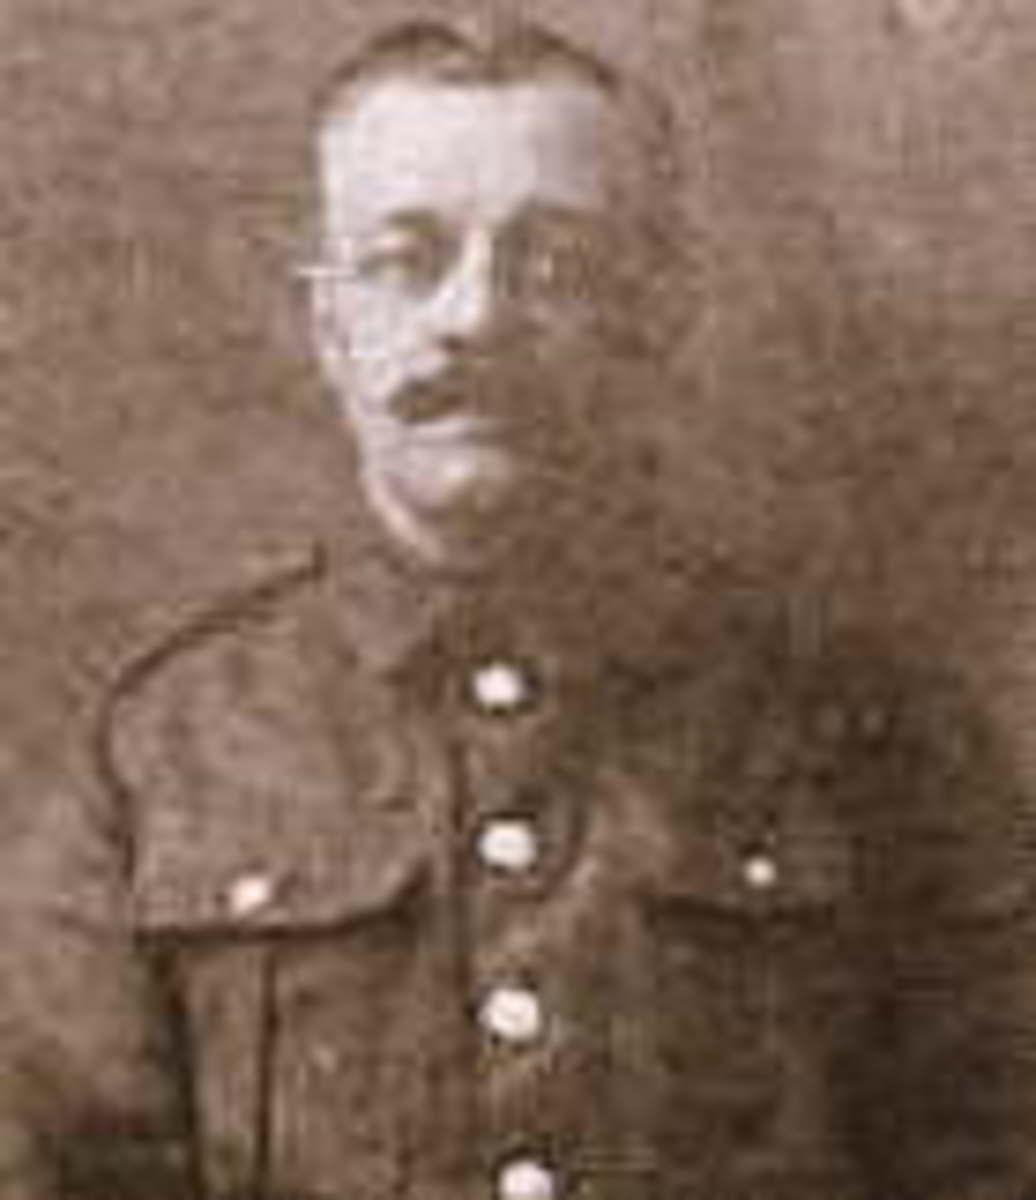 Bugler Reginald George Bennett, 1st DCLI (1889-1917) photographed around 1915.